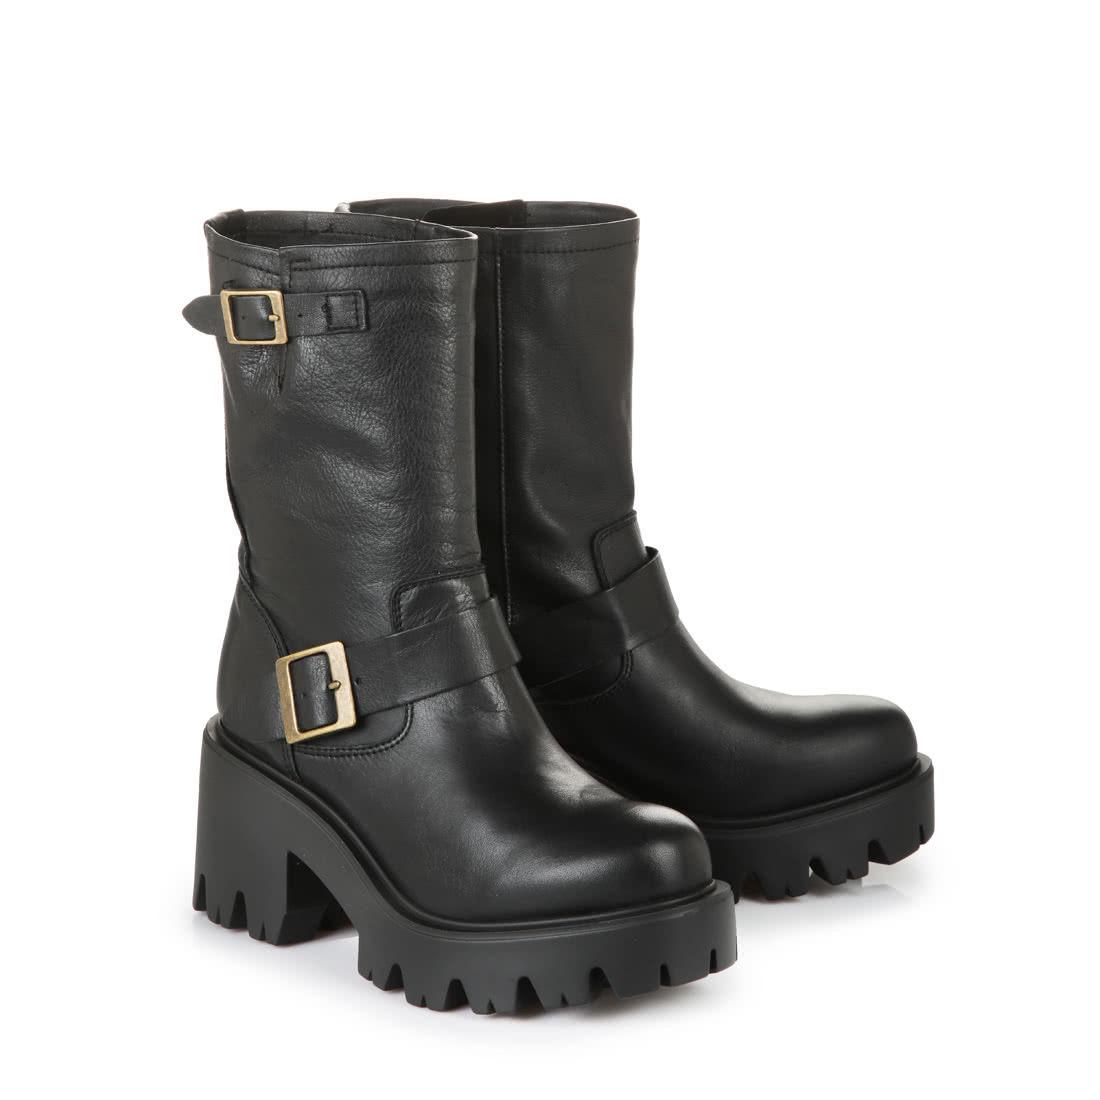 Buffalo Leather Platform Ankle Boots Buy Online In Buffalo